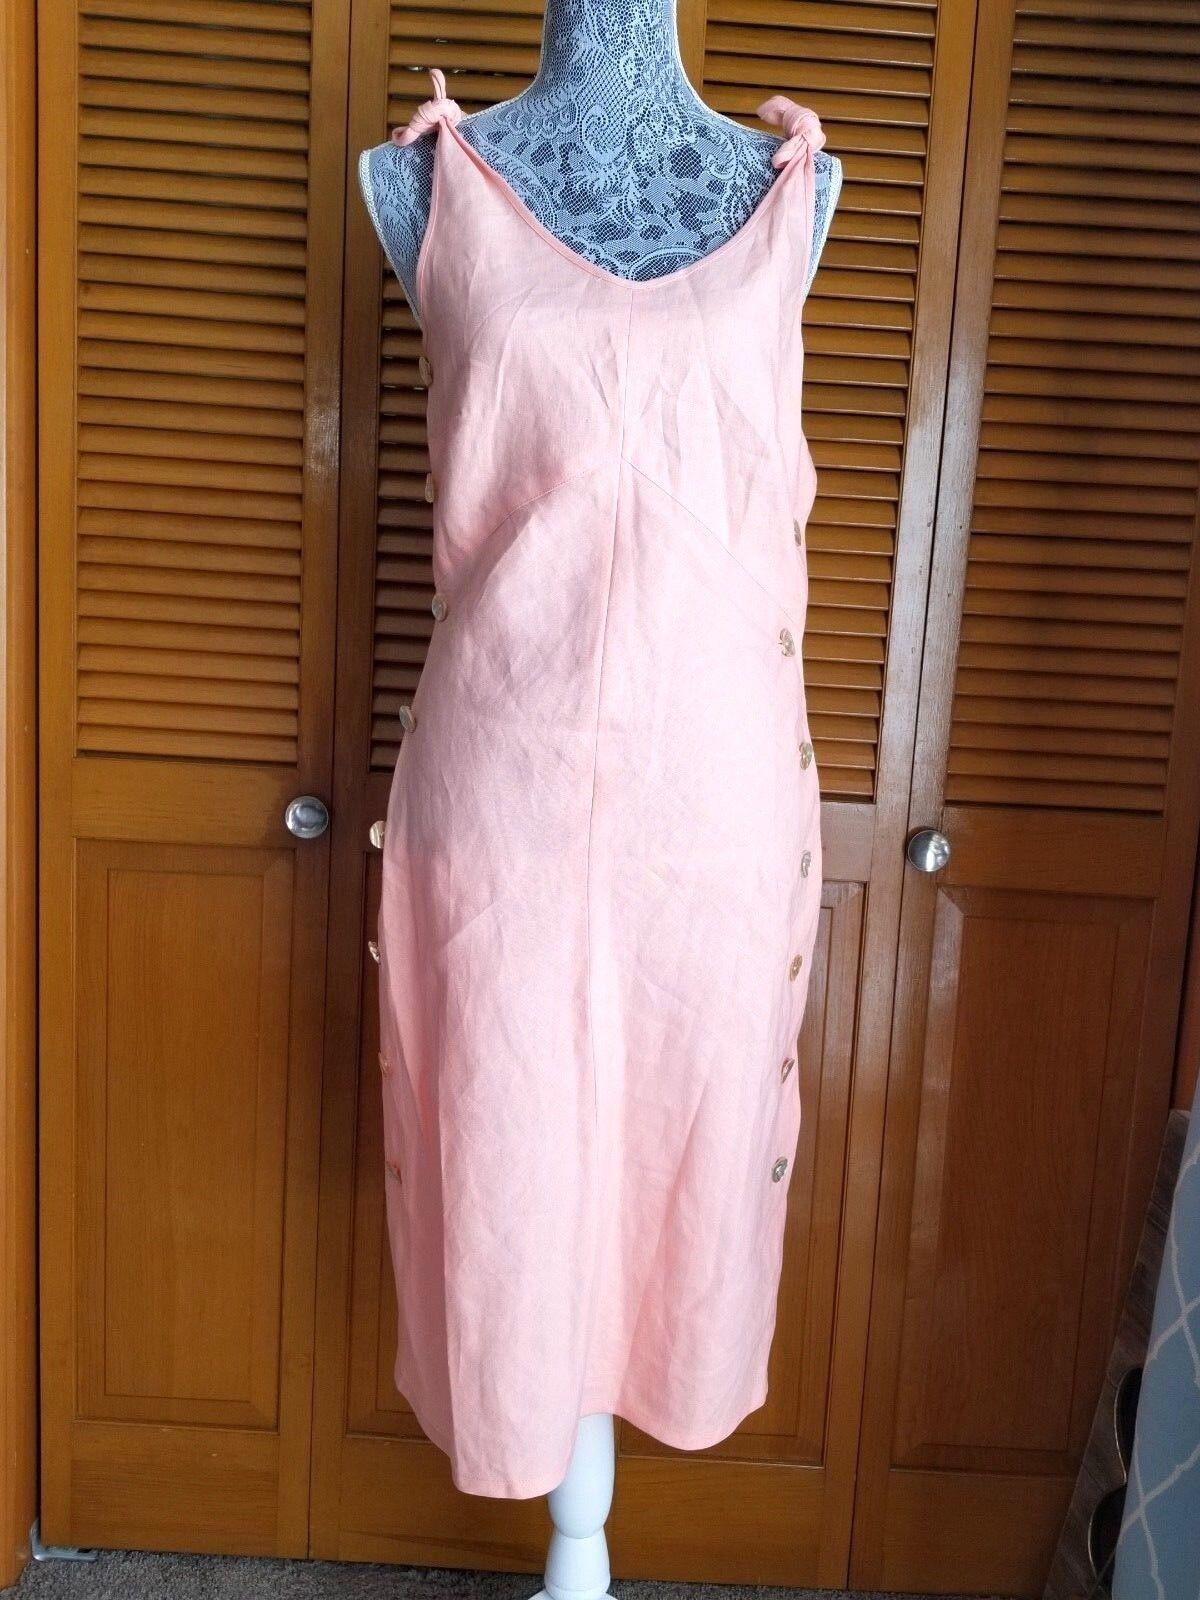 J Peterman Linen Dress Womens 4 Full Side Closure Shell Buttons Shoulder Tie NEW